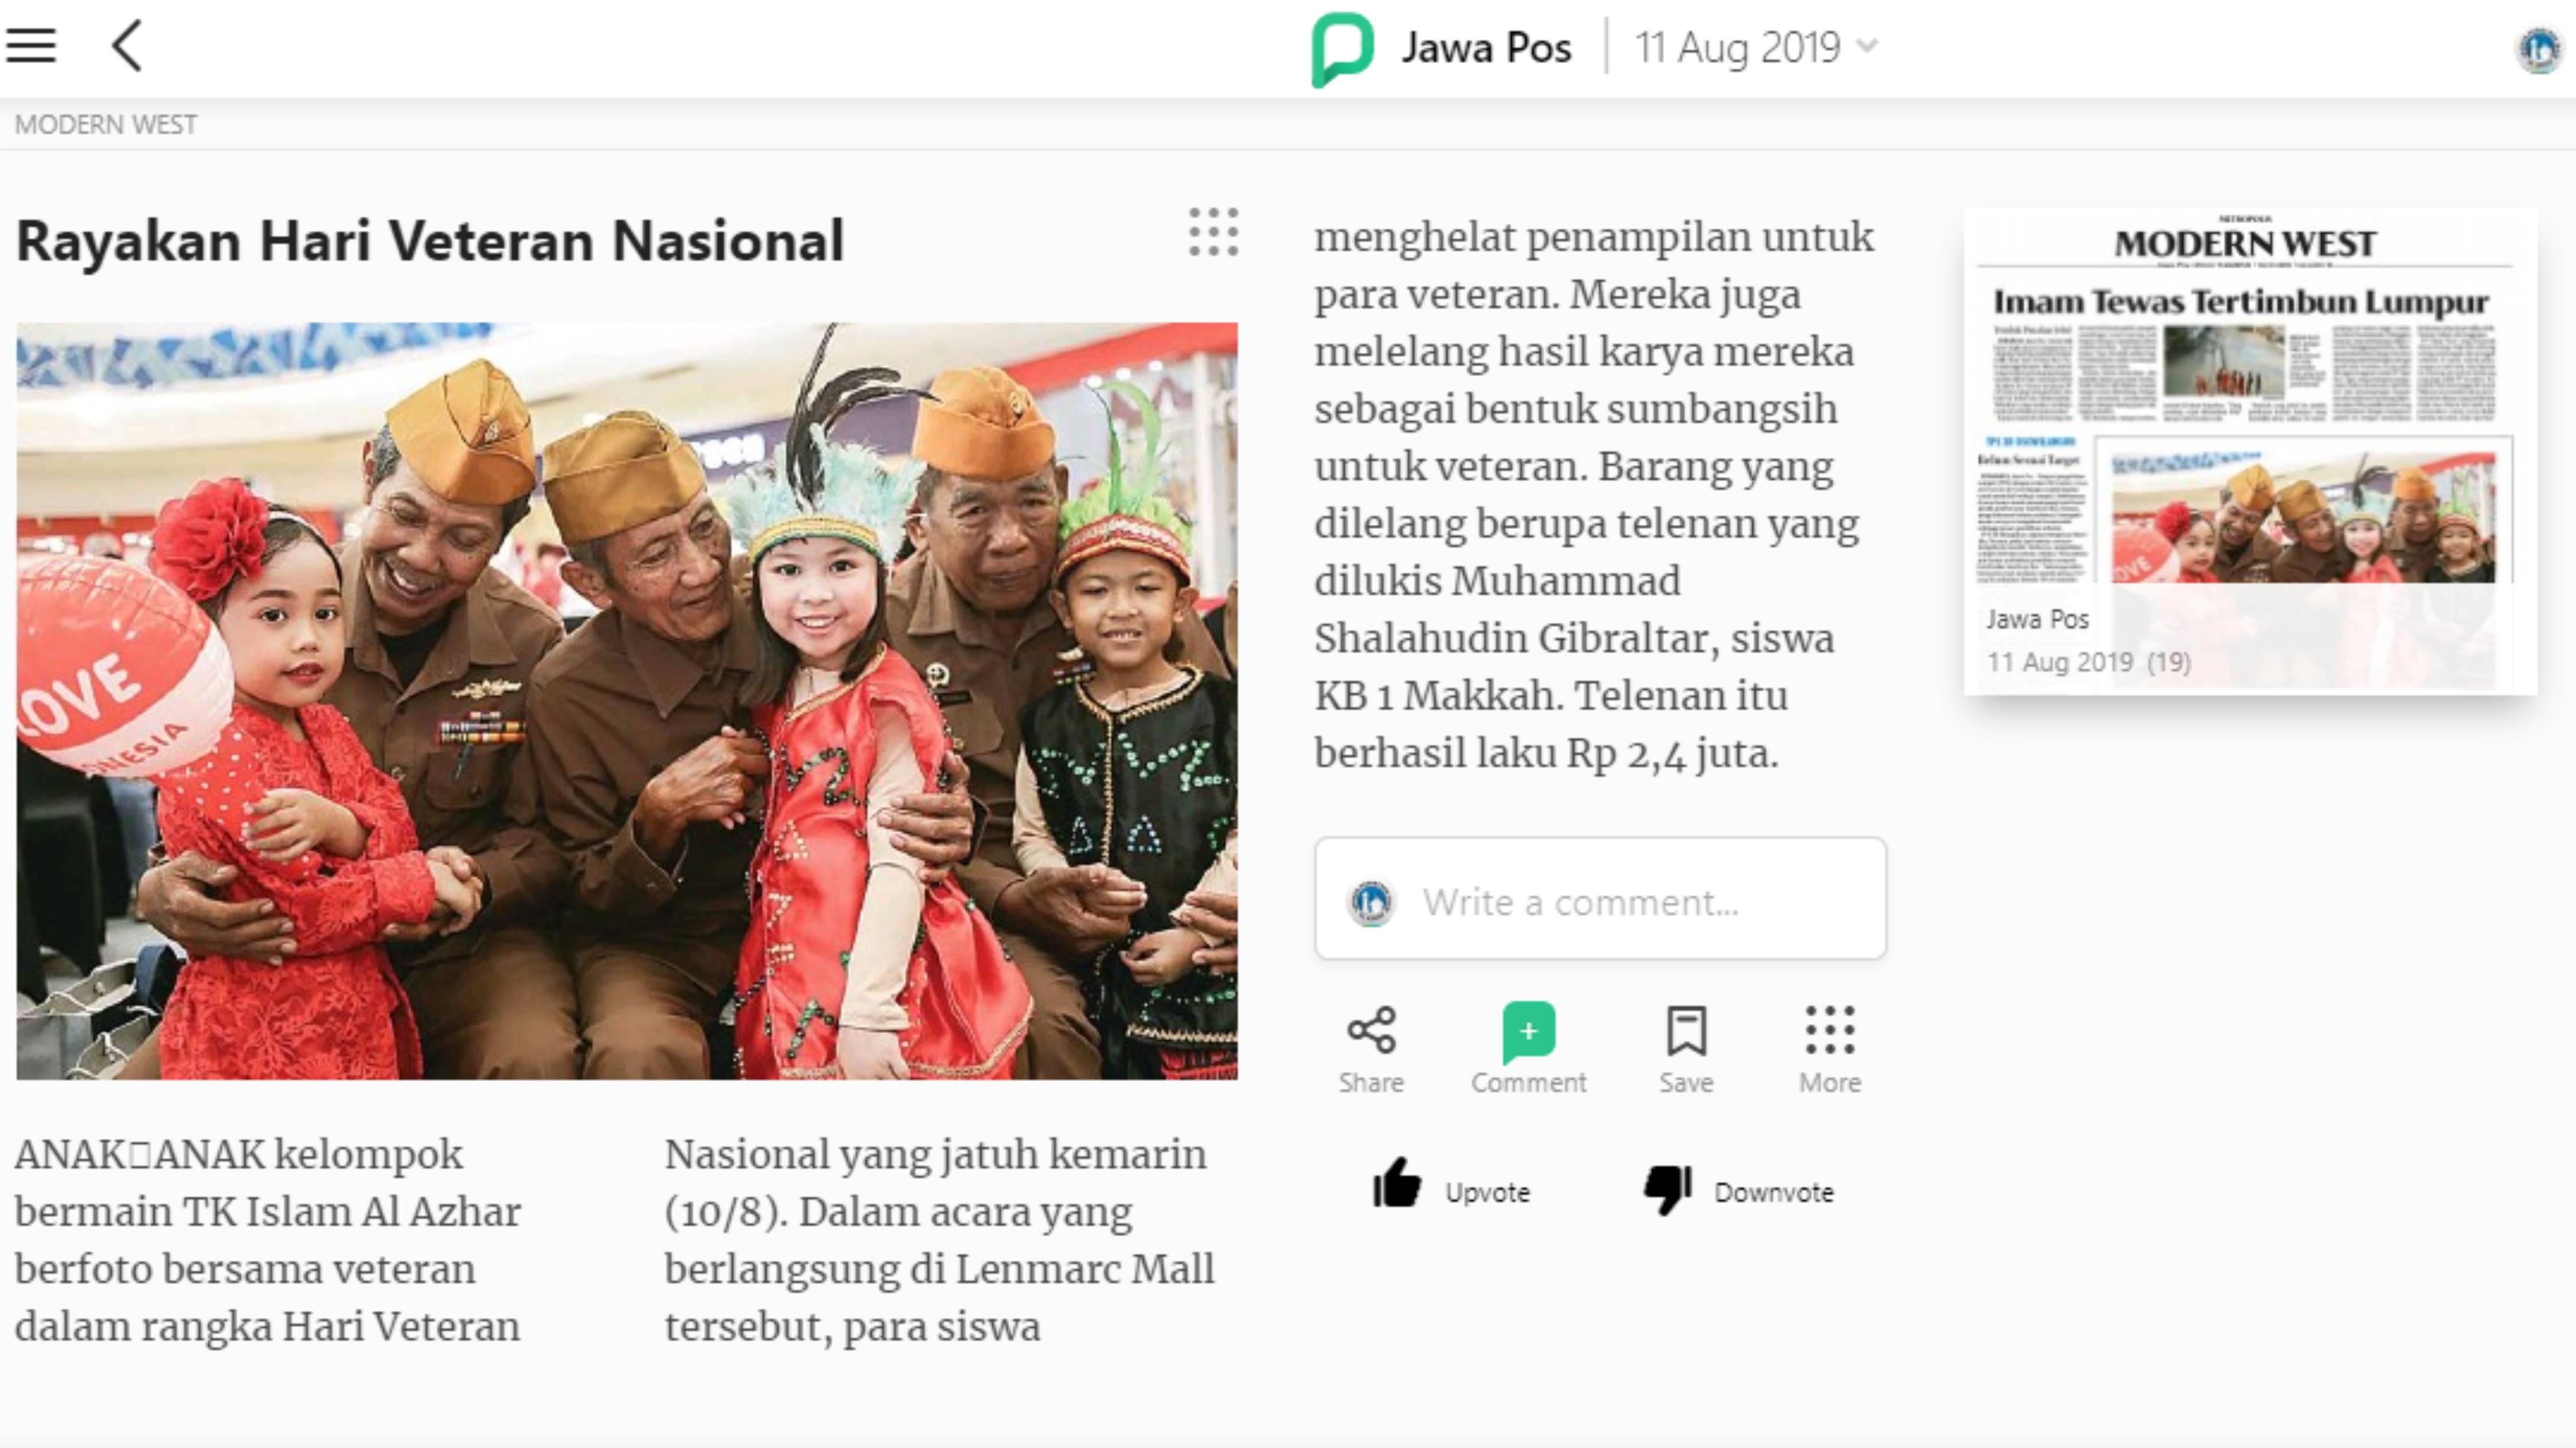 rayakan-hari-veteran-nasional-kbtkia-15-jawa-pos-minggu-11-agustus-2019-pressder